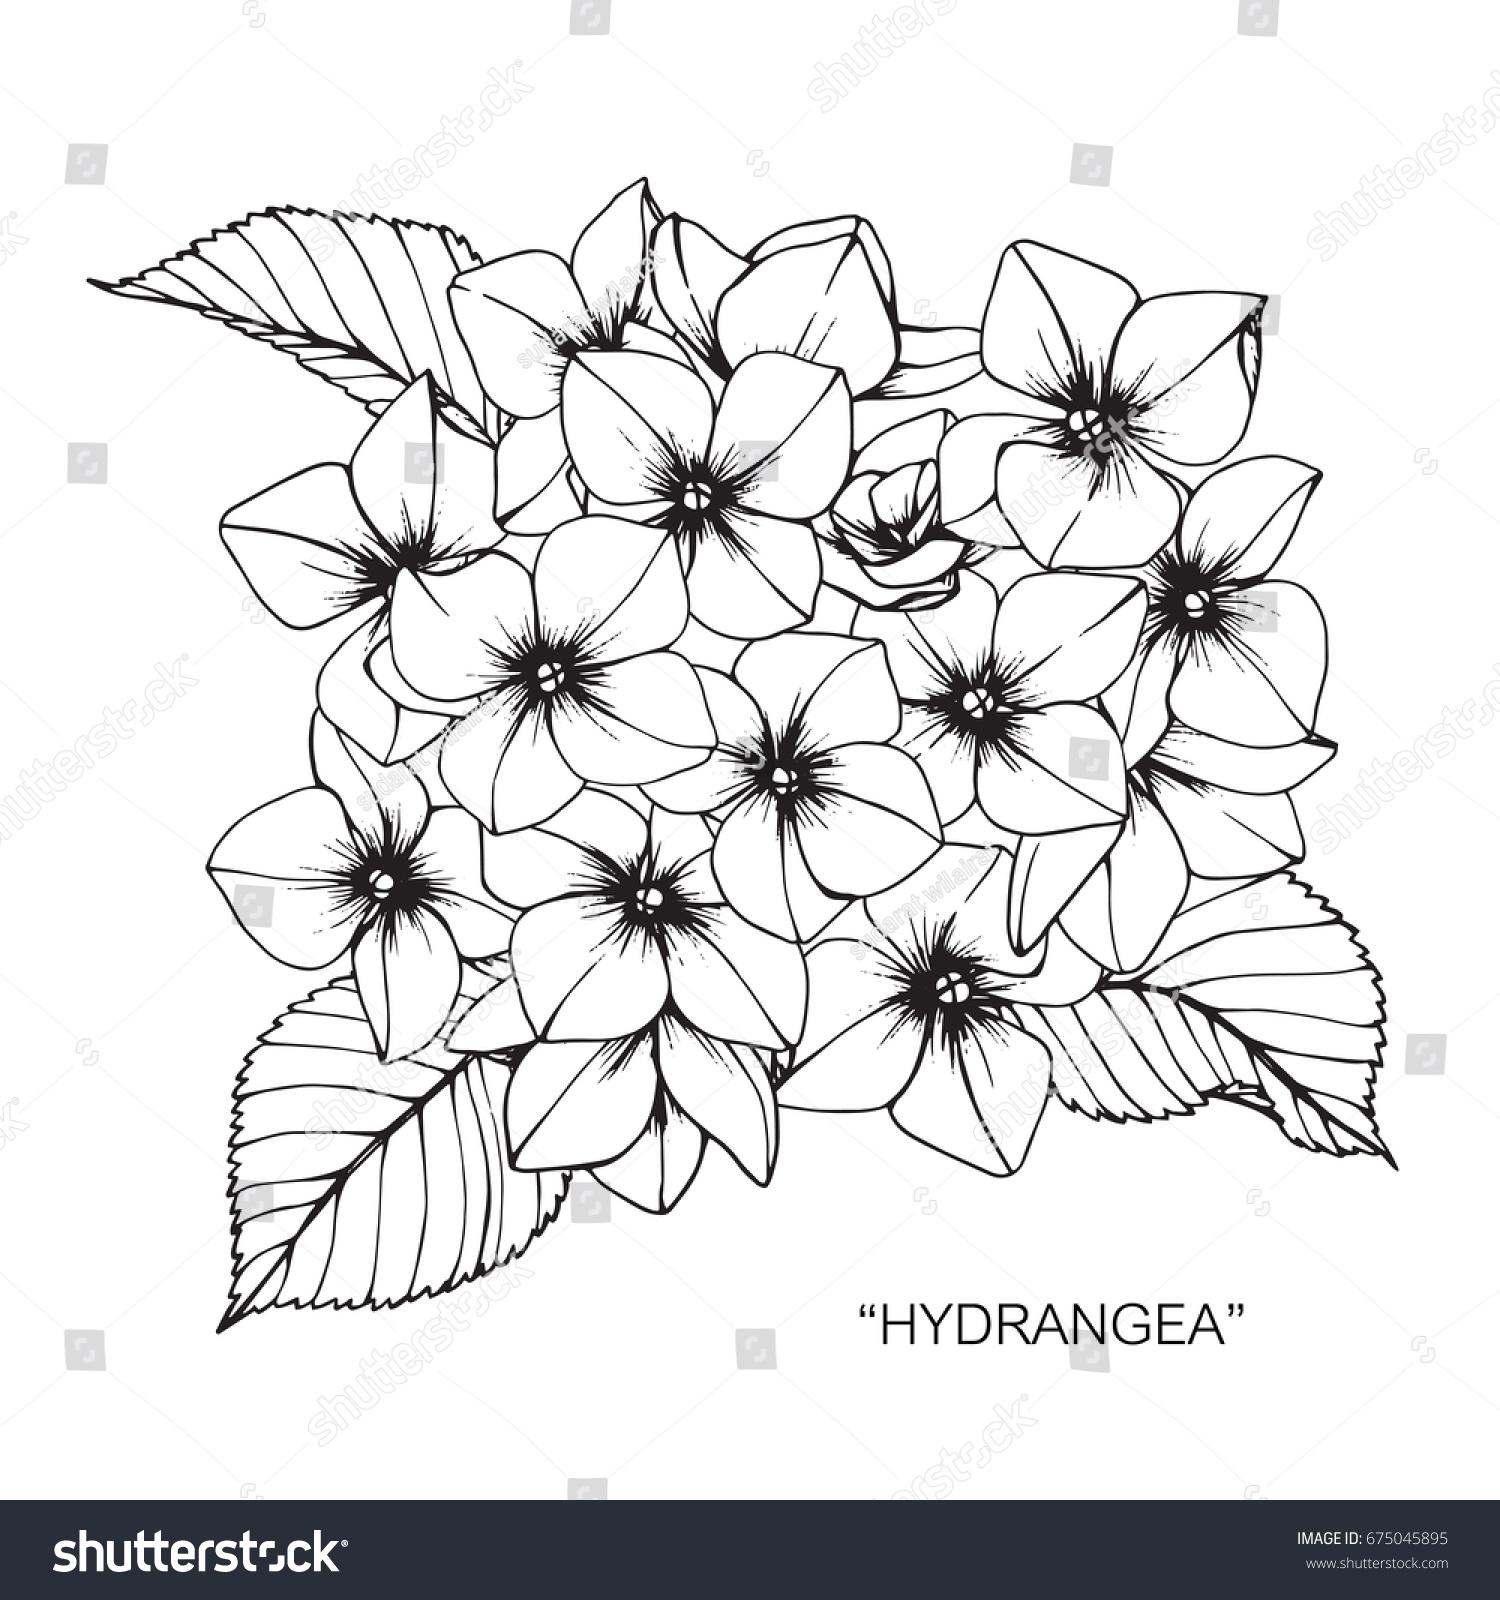 Bouquet Hydrangea Flowers Drawing Sketch Lineart Stock Vector